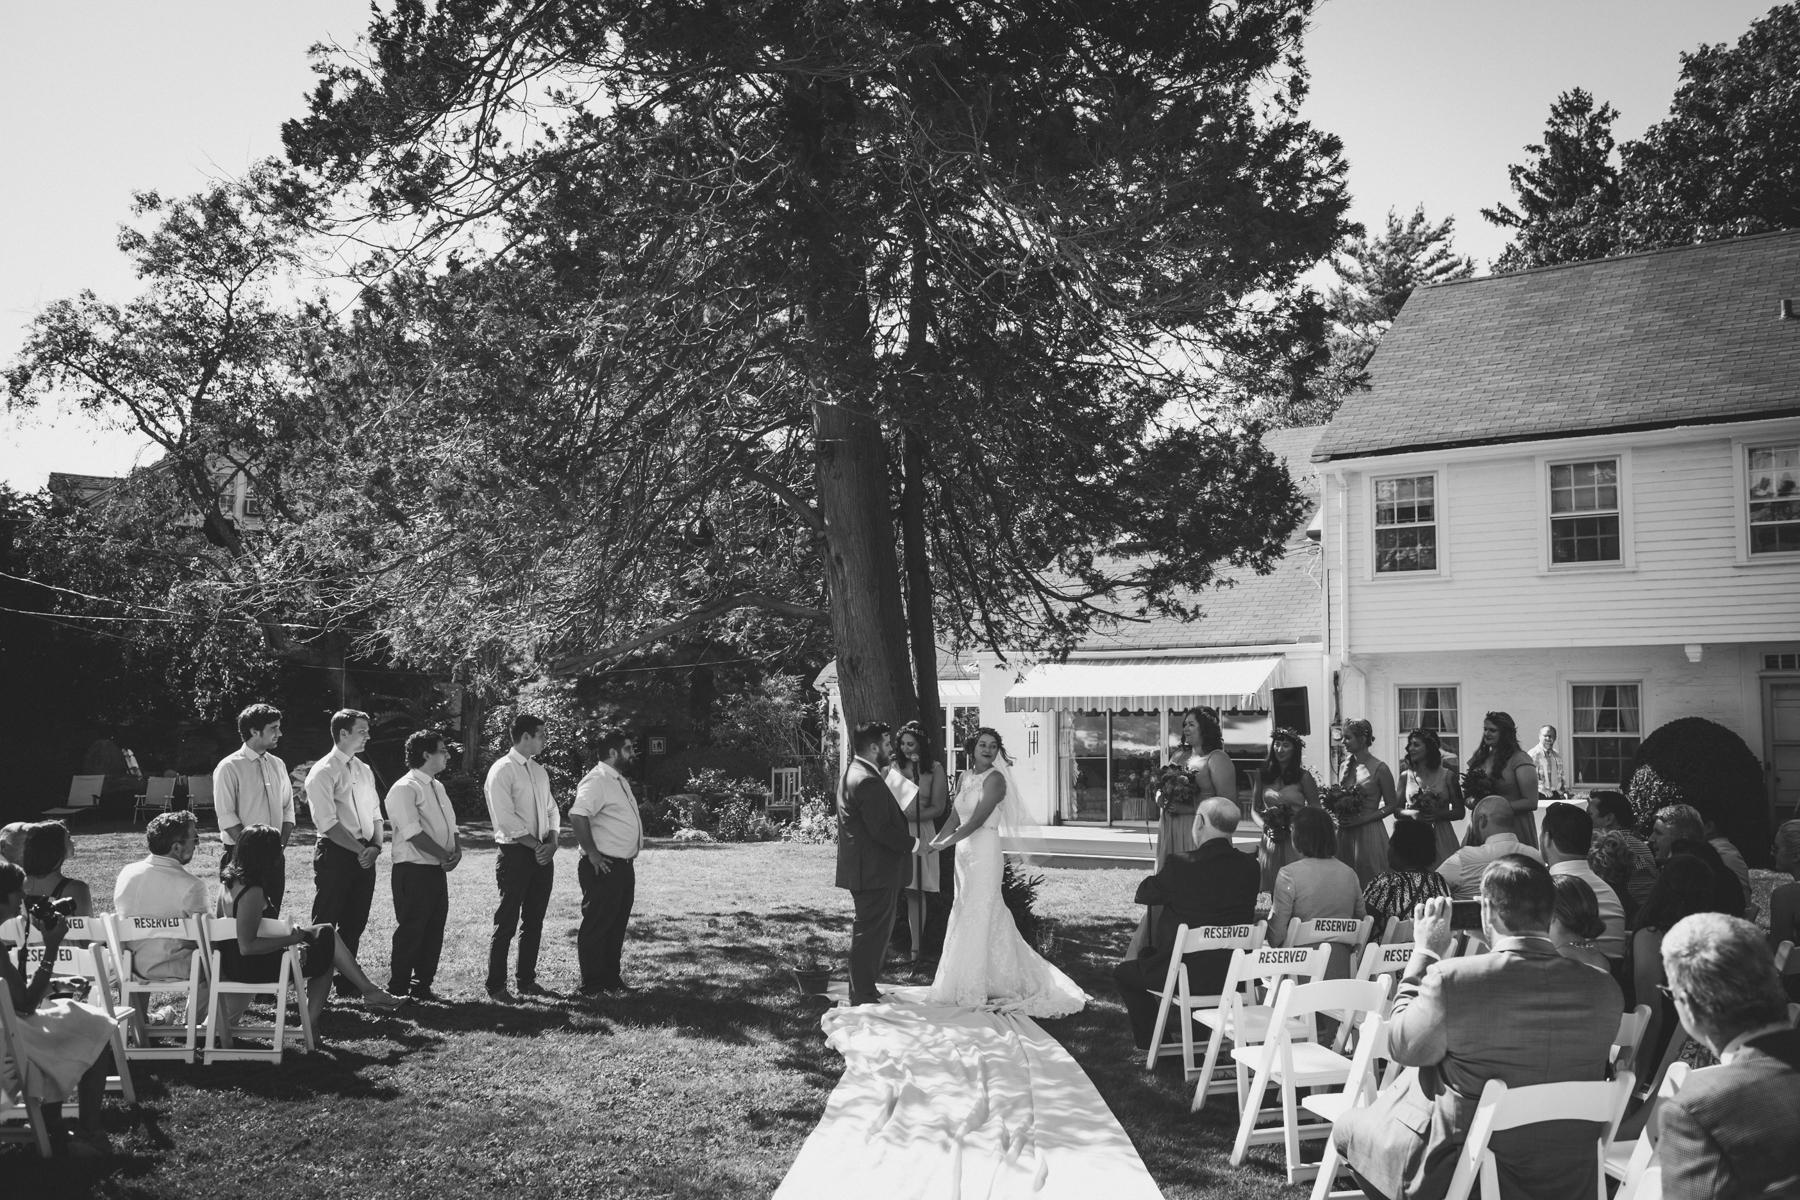 Long-Island-Documentary-Wedding-Photography-Summer-Tent-Wedding-in-New-York-64.jpg